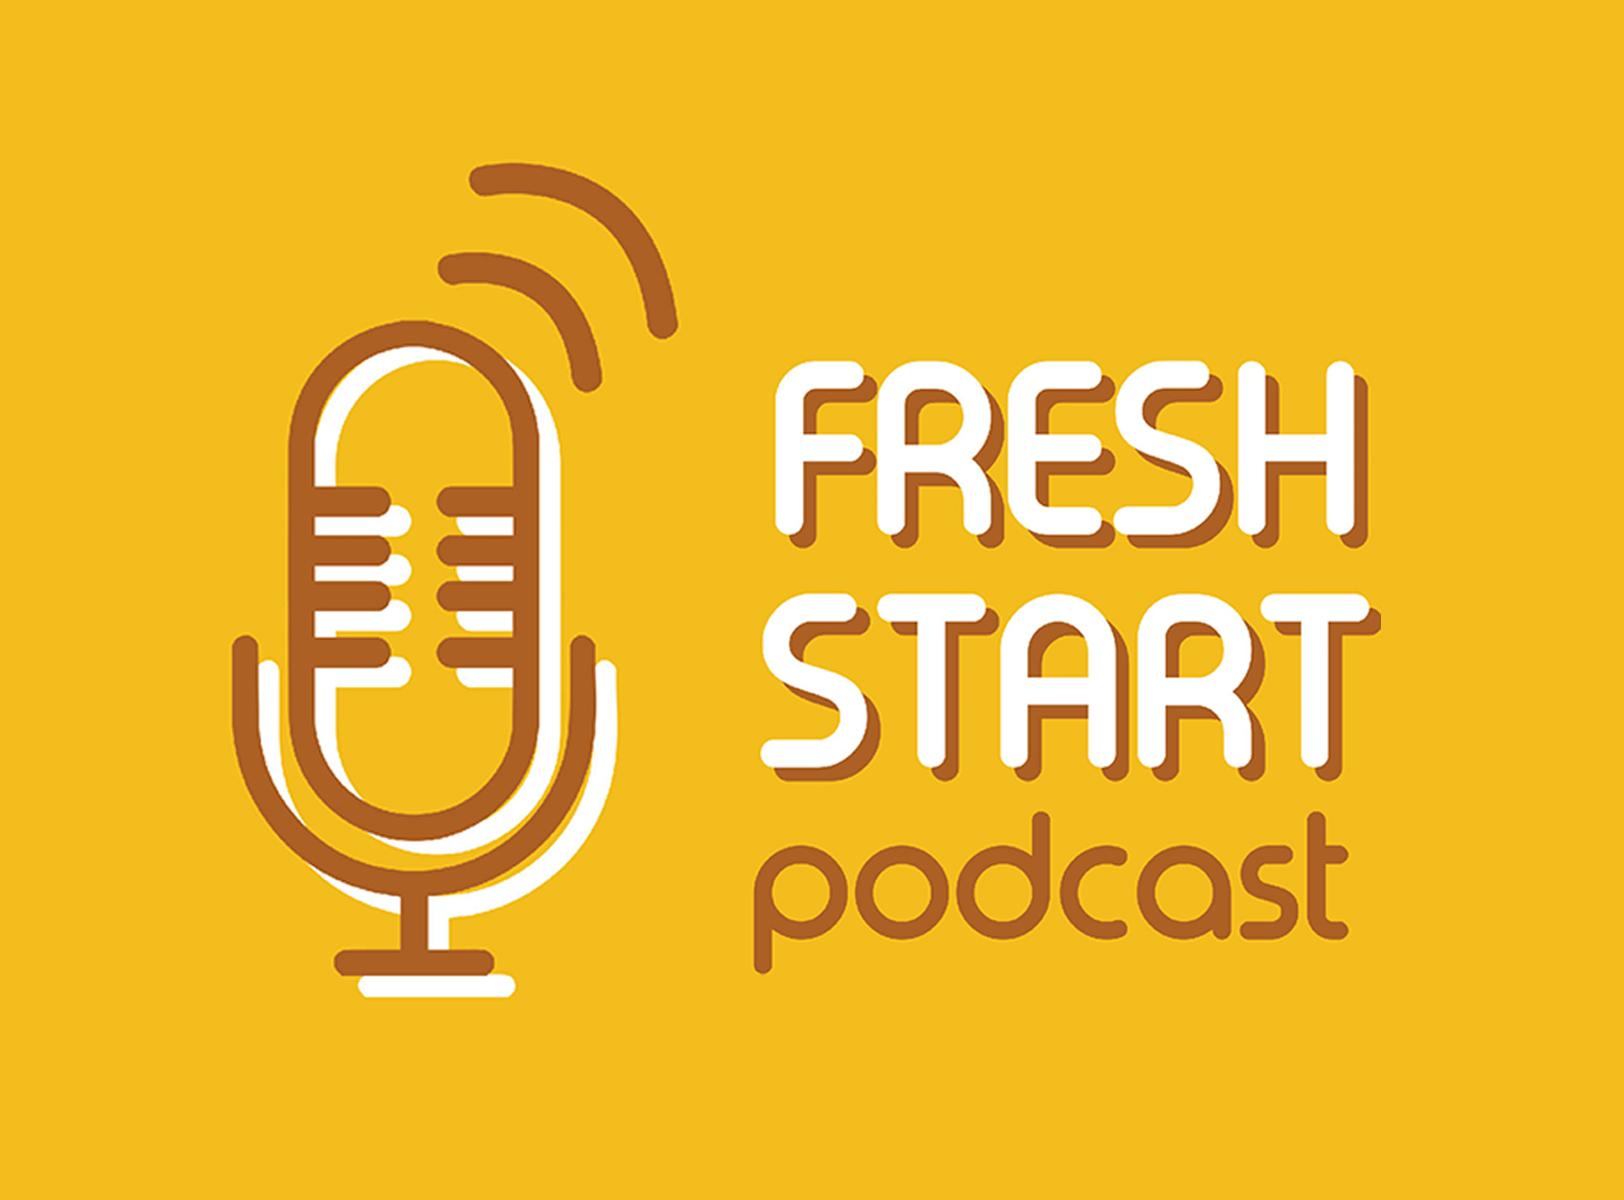 Fresh Start: Podcast News (7/18/2019 Thu.)